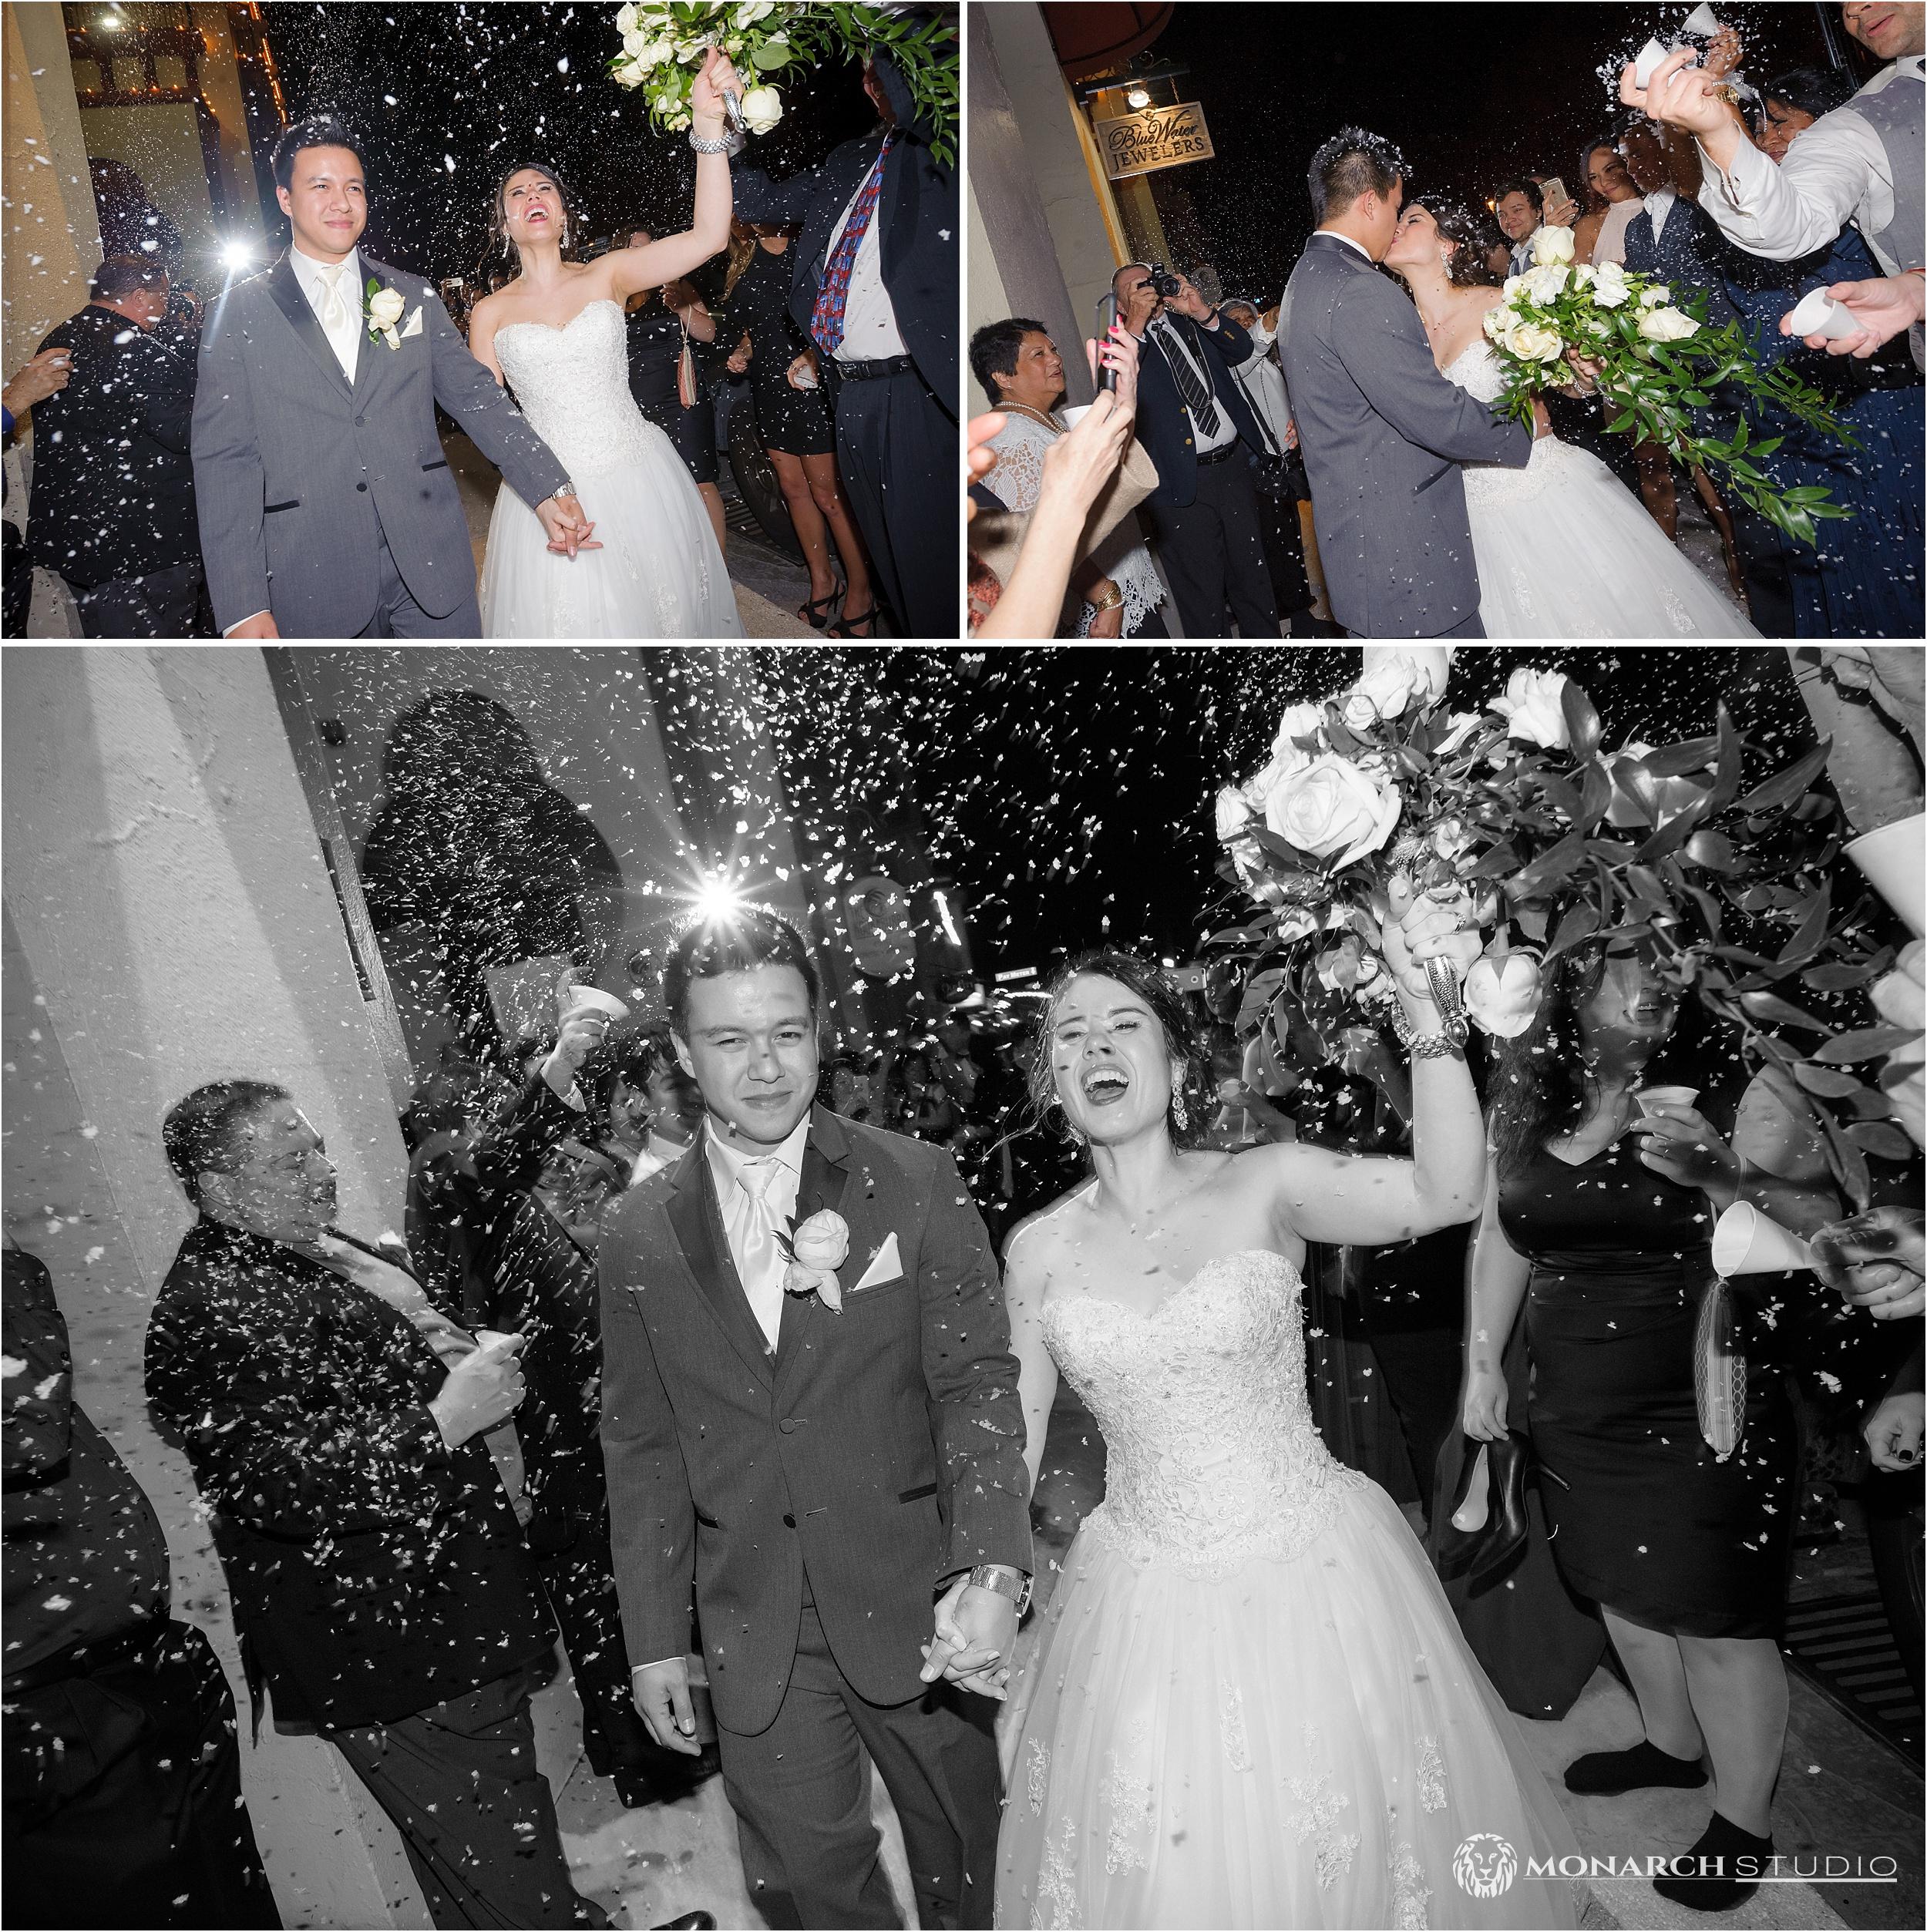 wedding-photographer-in-st-augustine-florida-treasury-125.jpg